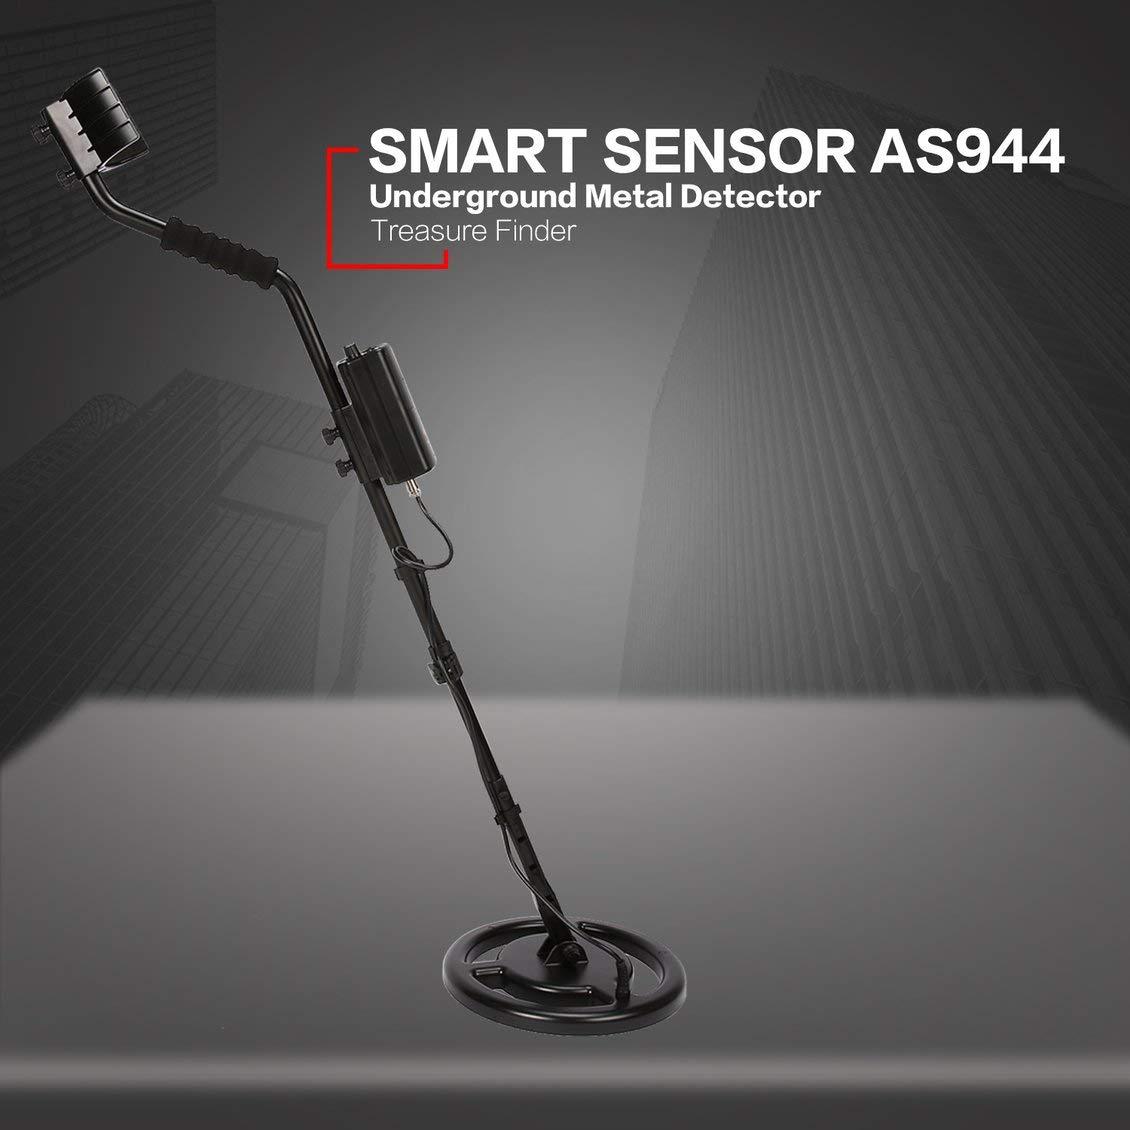 Amazon.com : PGIGE Smart Sensor AS944 Professional Underground Metal Detector Adjustable Gold Silver Finder Treasure Hunter Tracker 3m Depth : Garden & ...